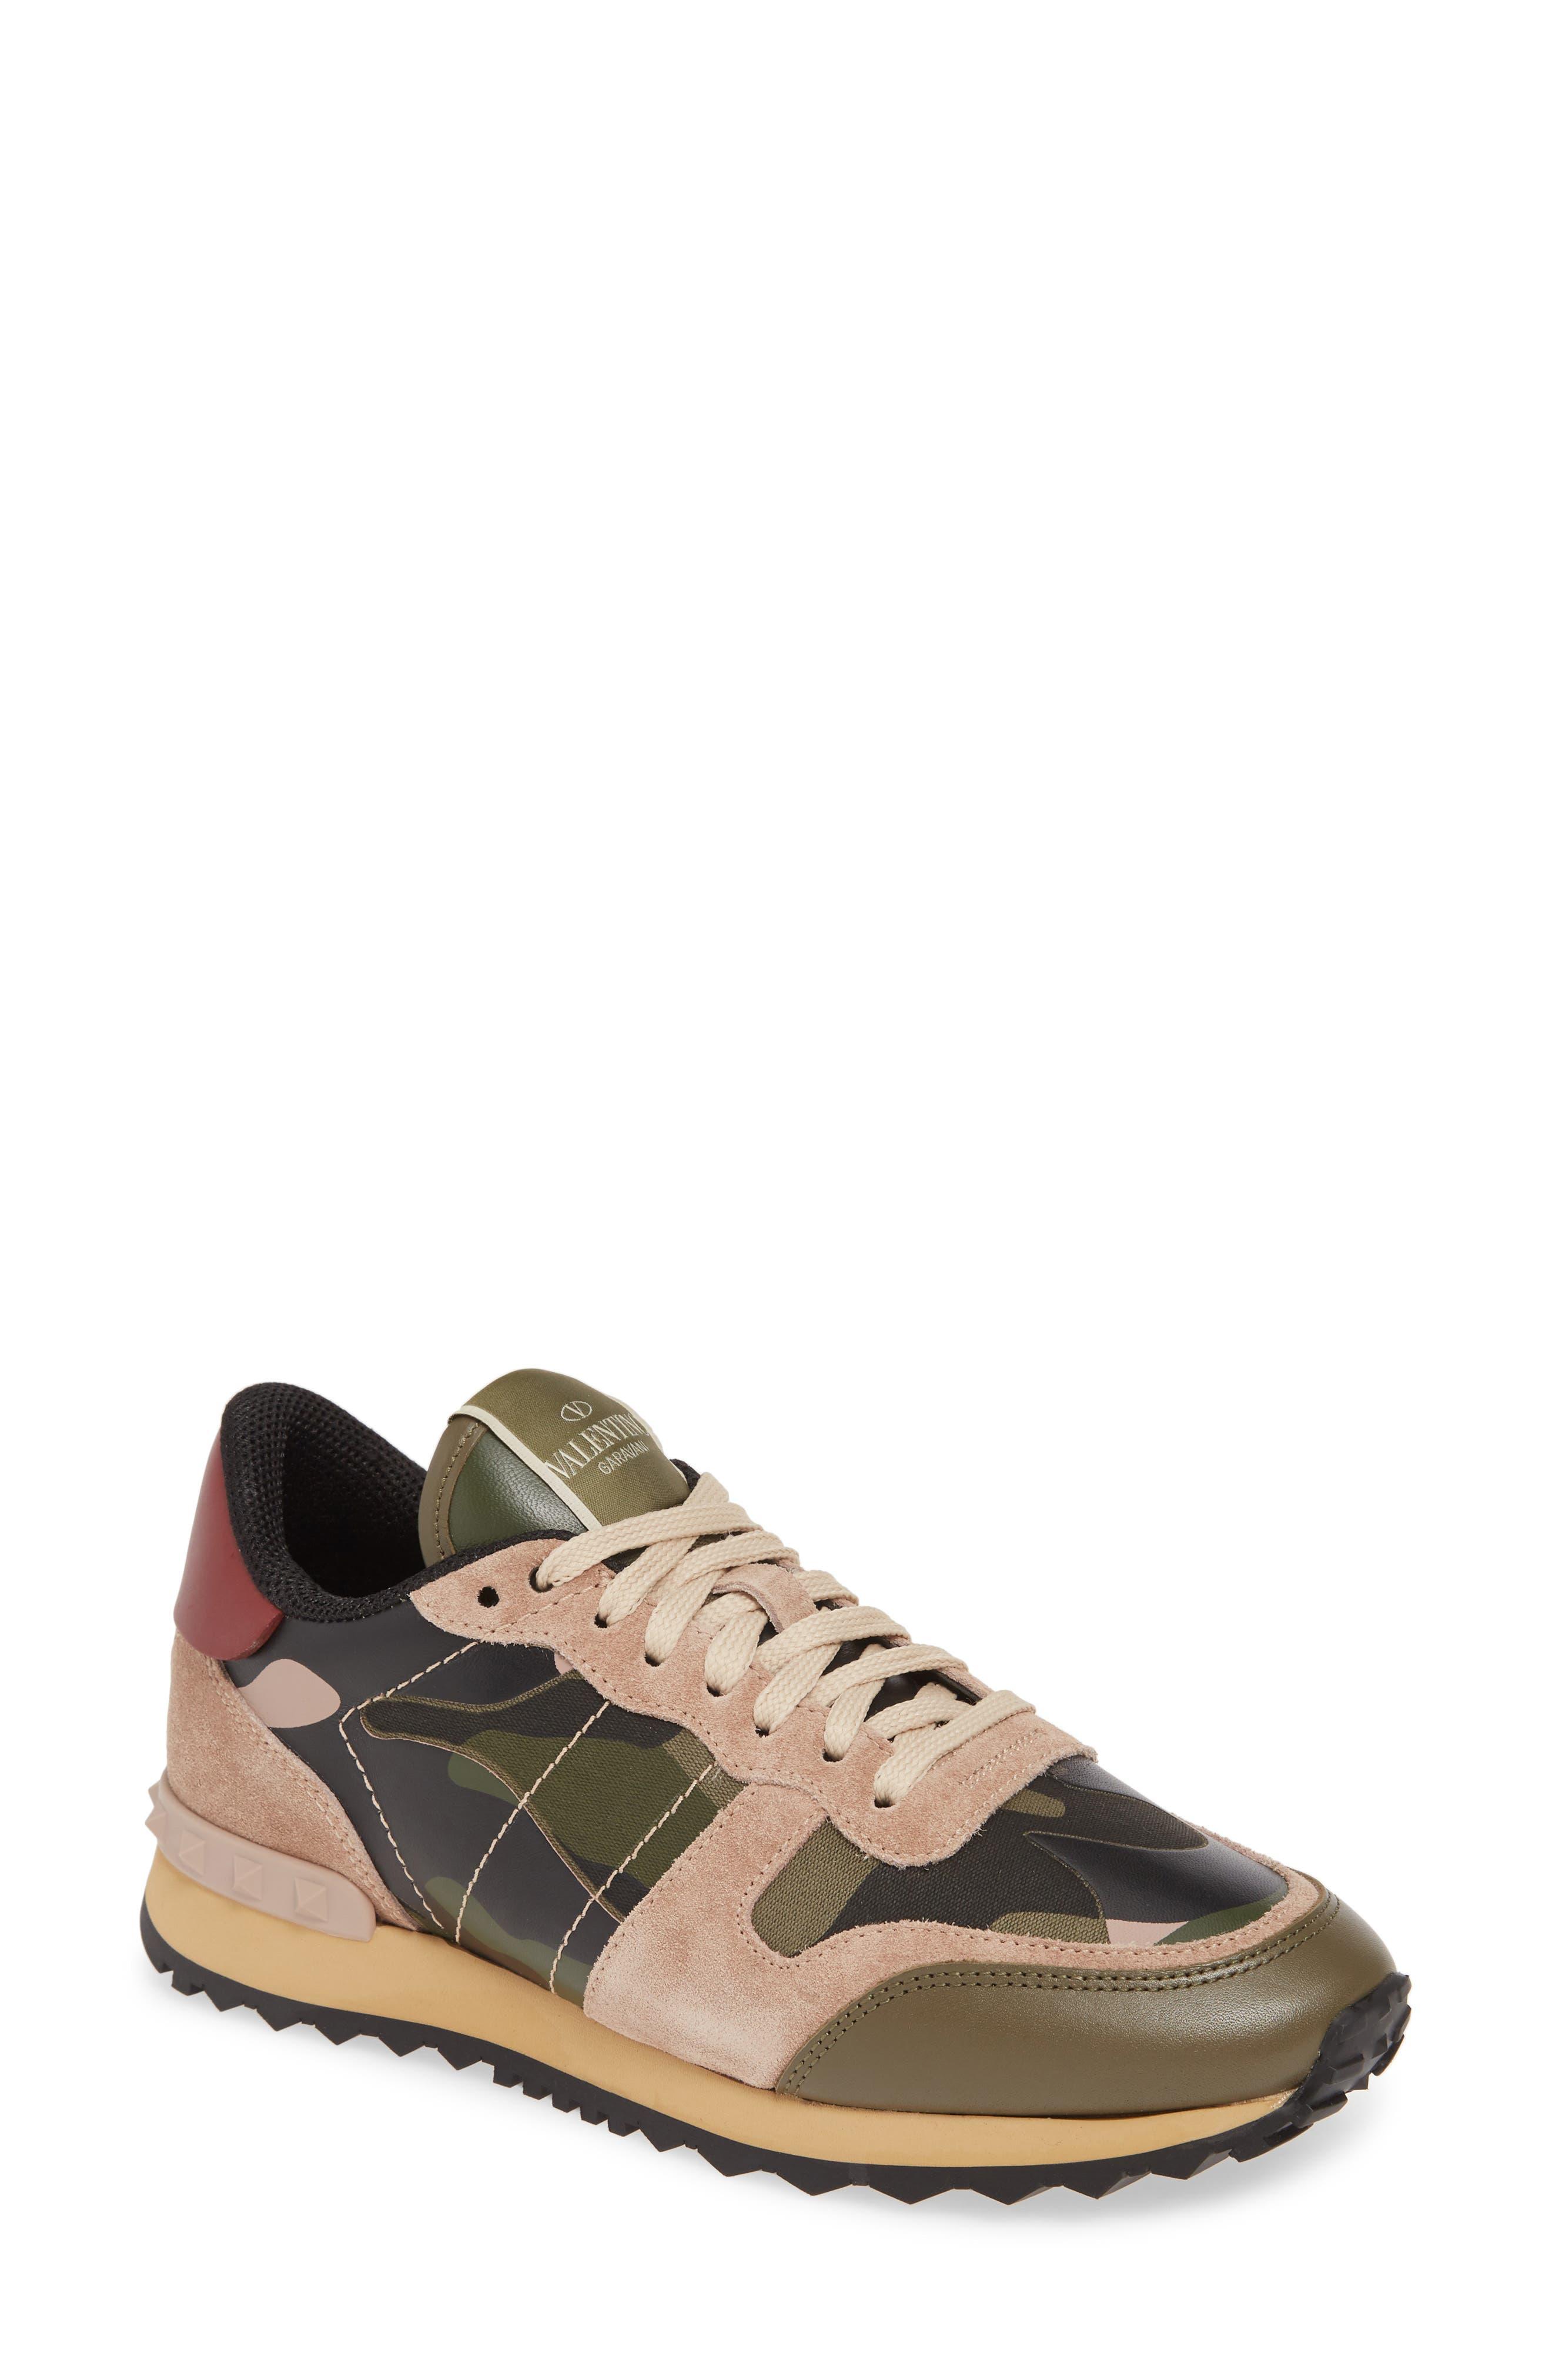 Women's Valentino Garavani Sneakers